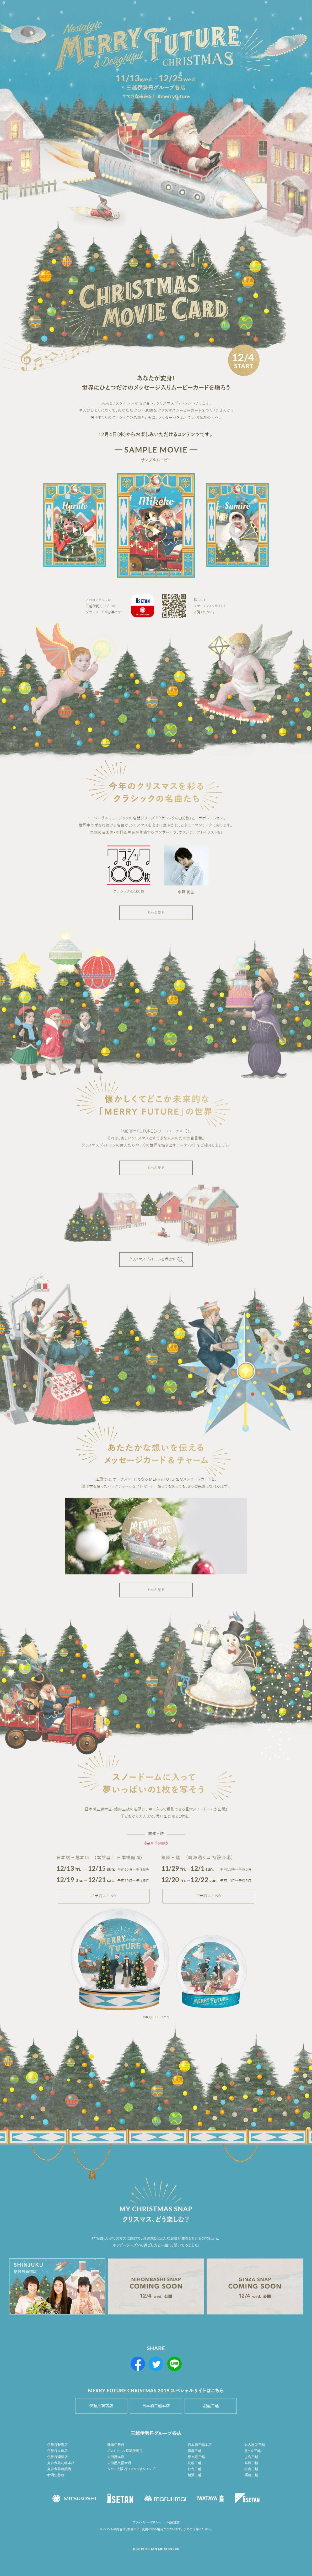 MERRY FUTURE クリスマスキャンペーン 2019 | 三越伊勢丹グループ